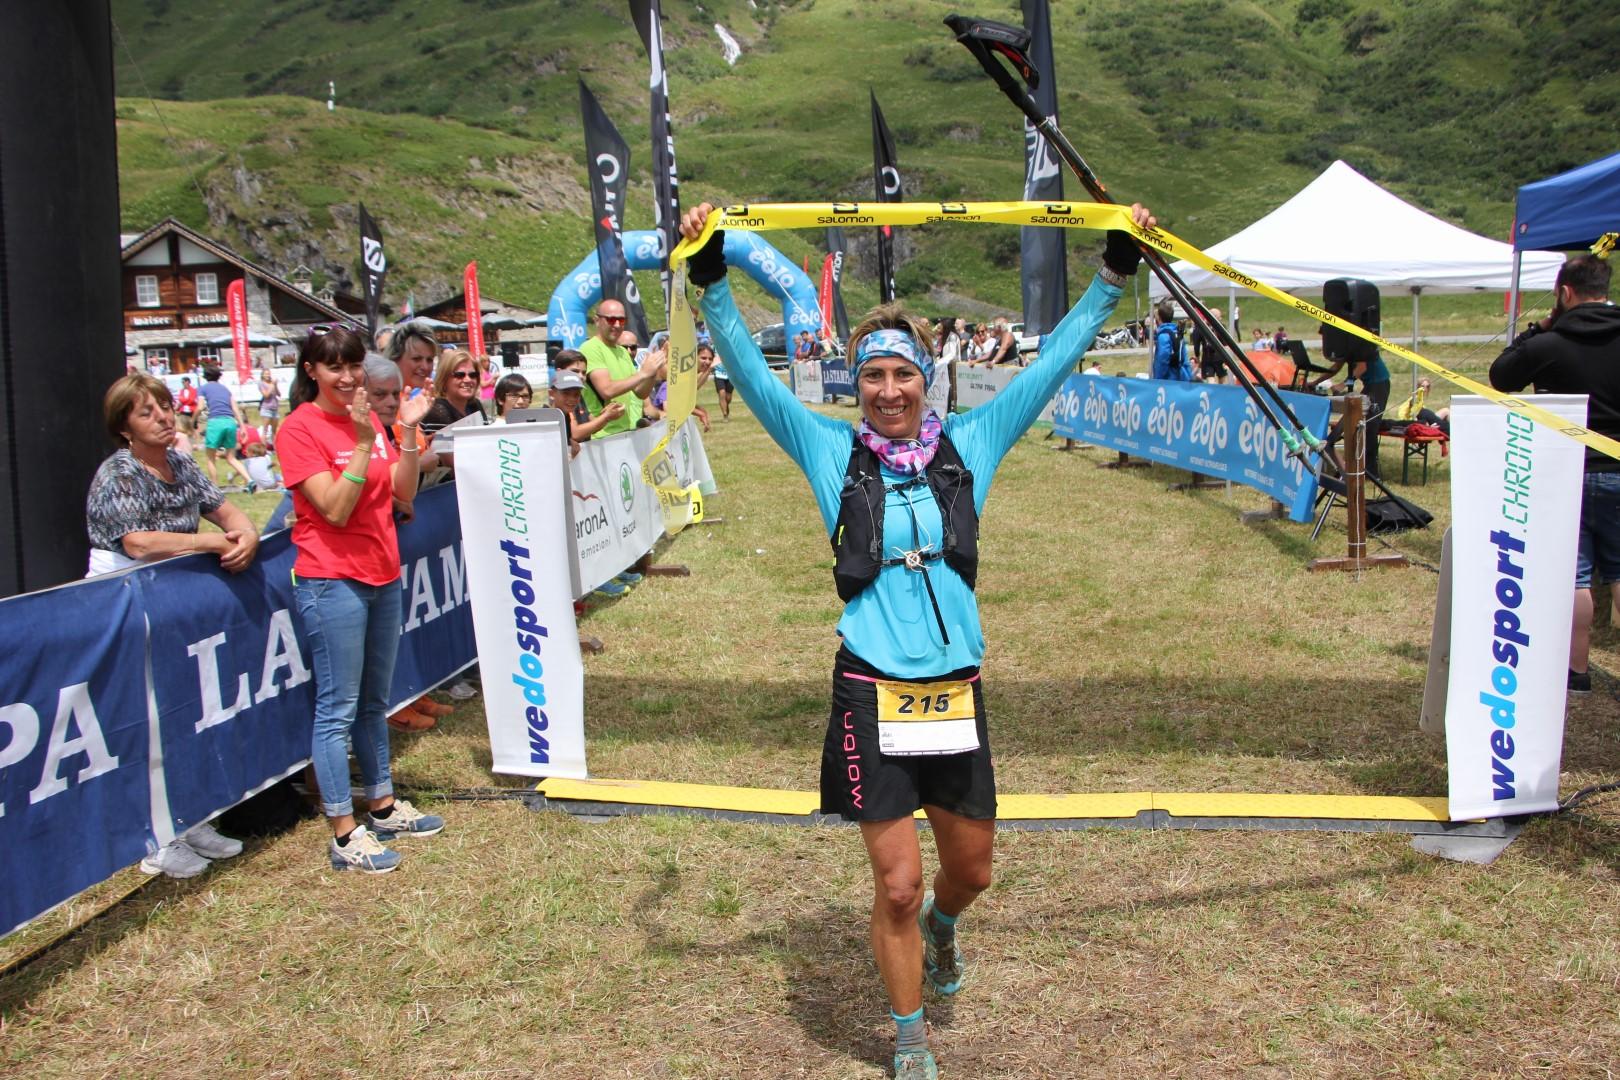 Francesca Canepa, winner of BT 52 km